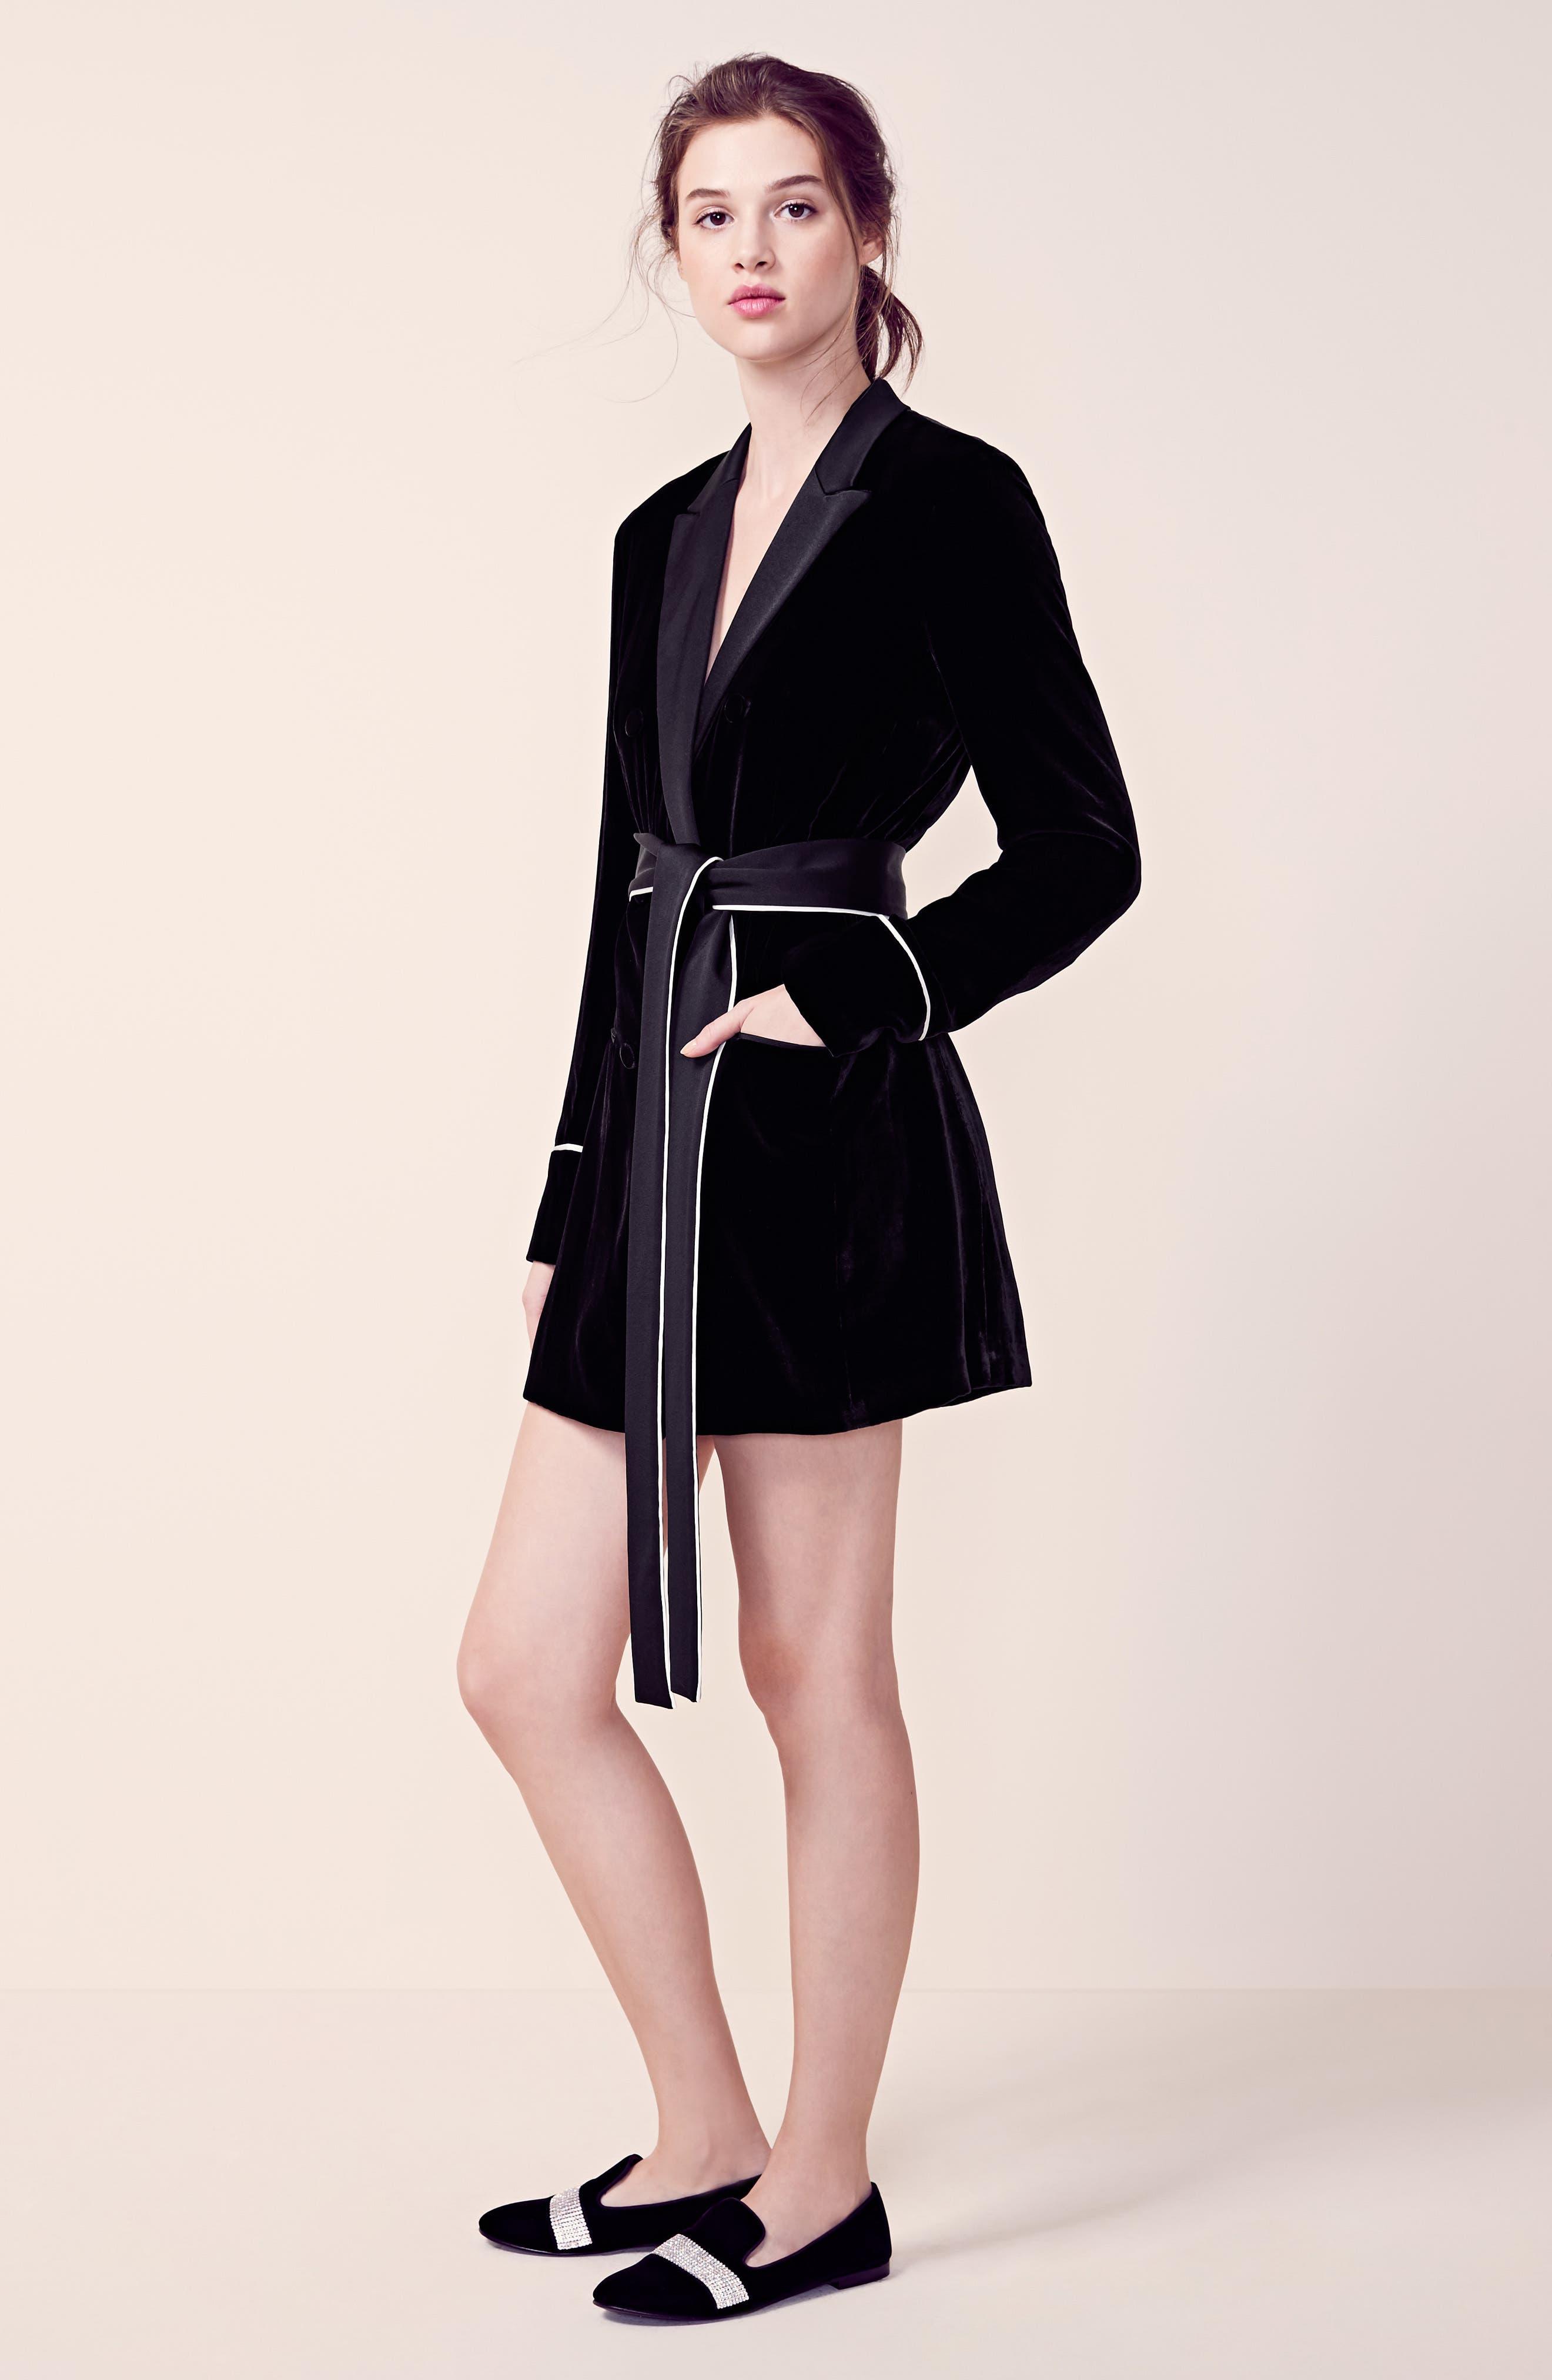 Diane Kruger x GREY Jason Wu Velvet Shirtdress,                             Alternate thumbnail 6, color,                             001